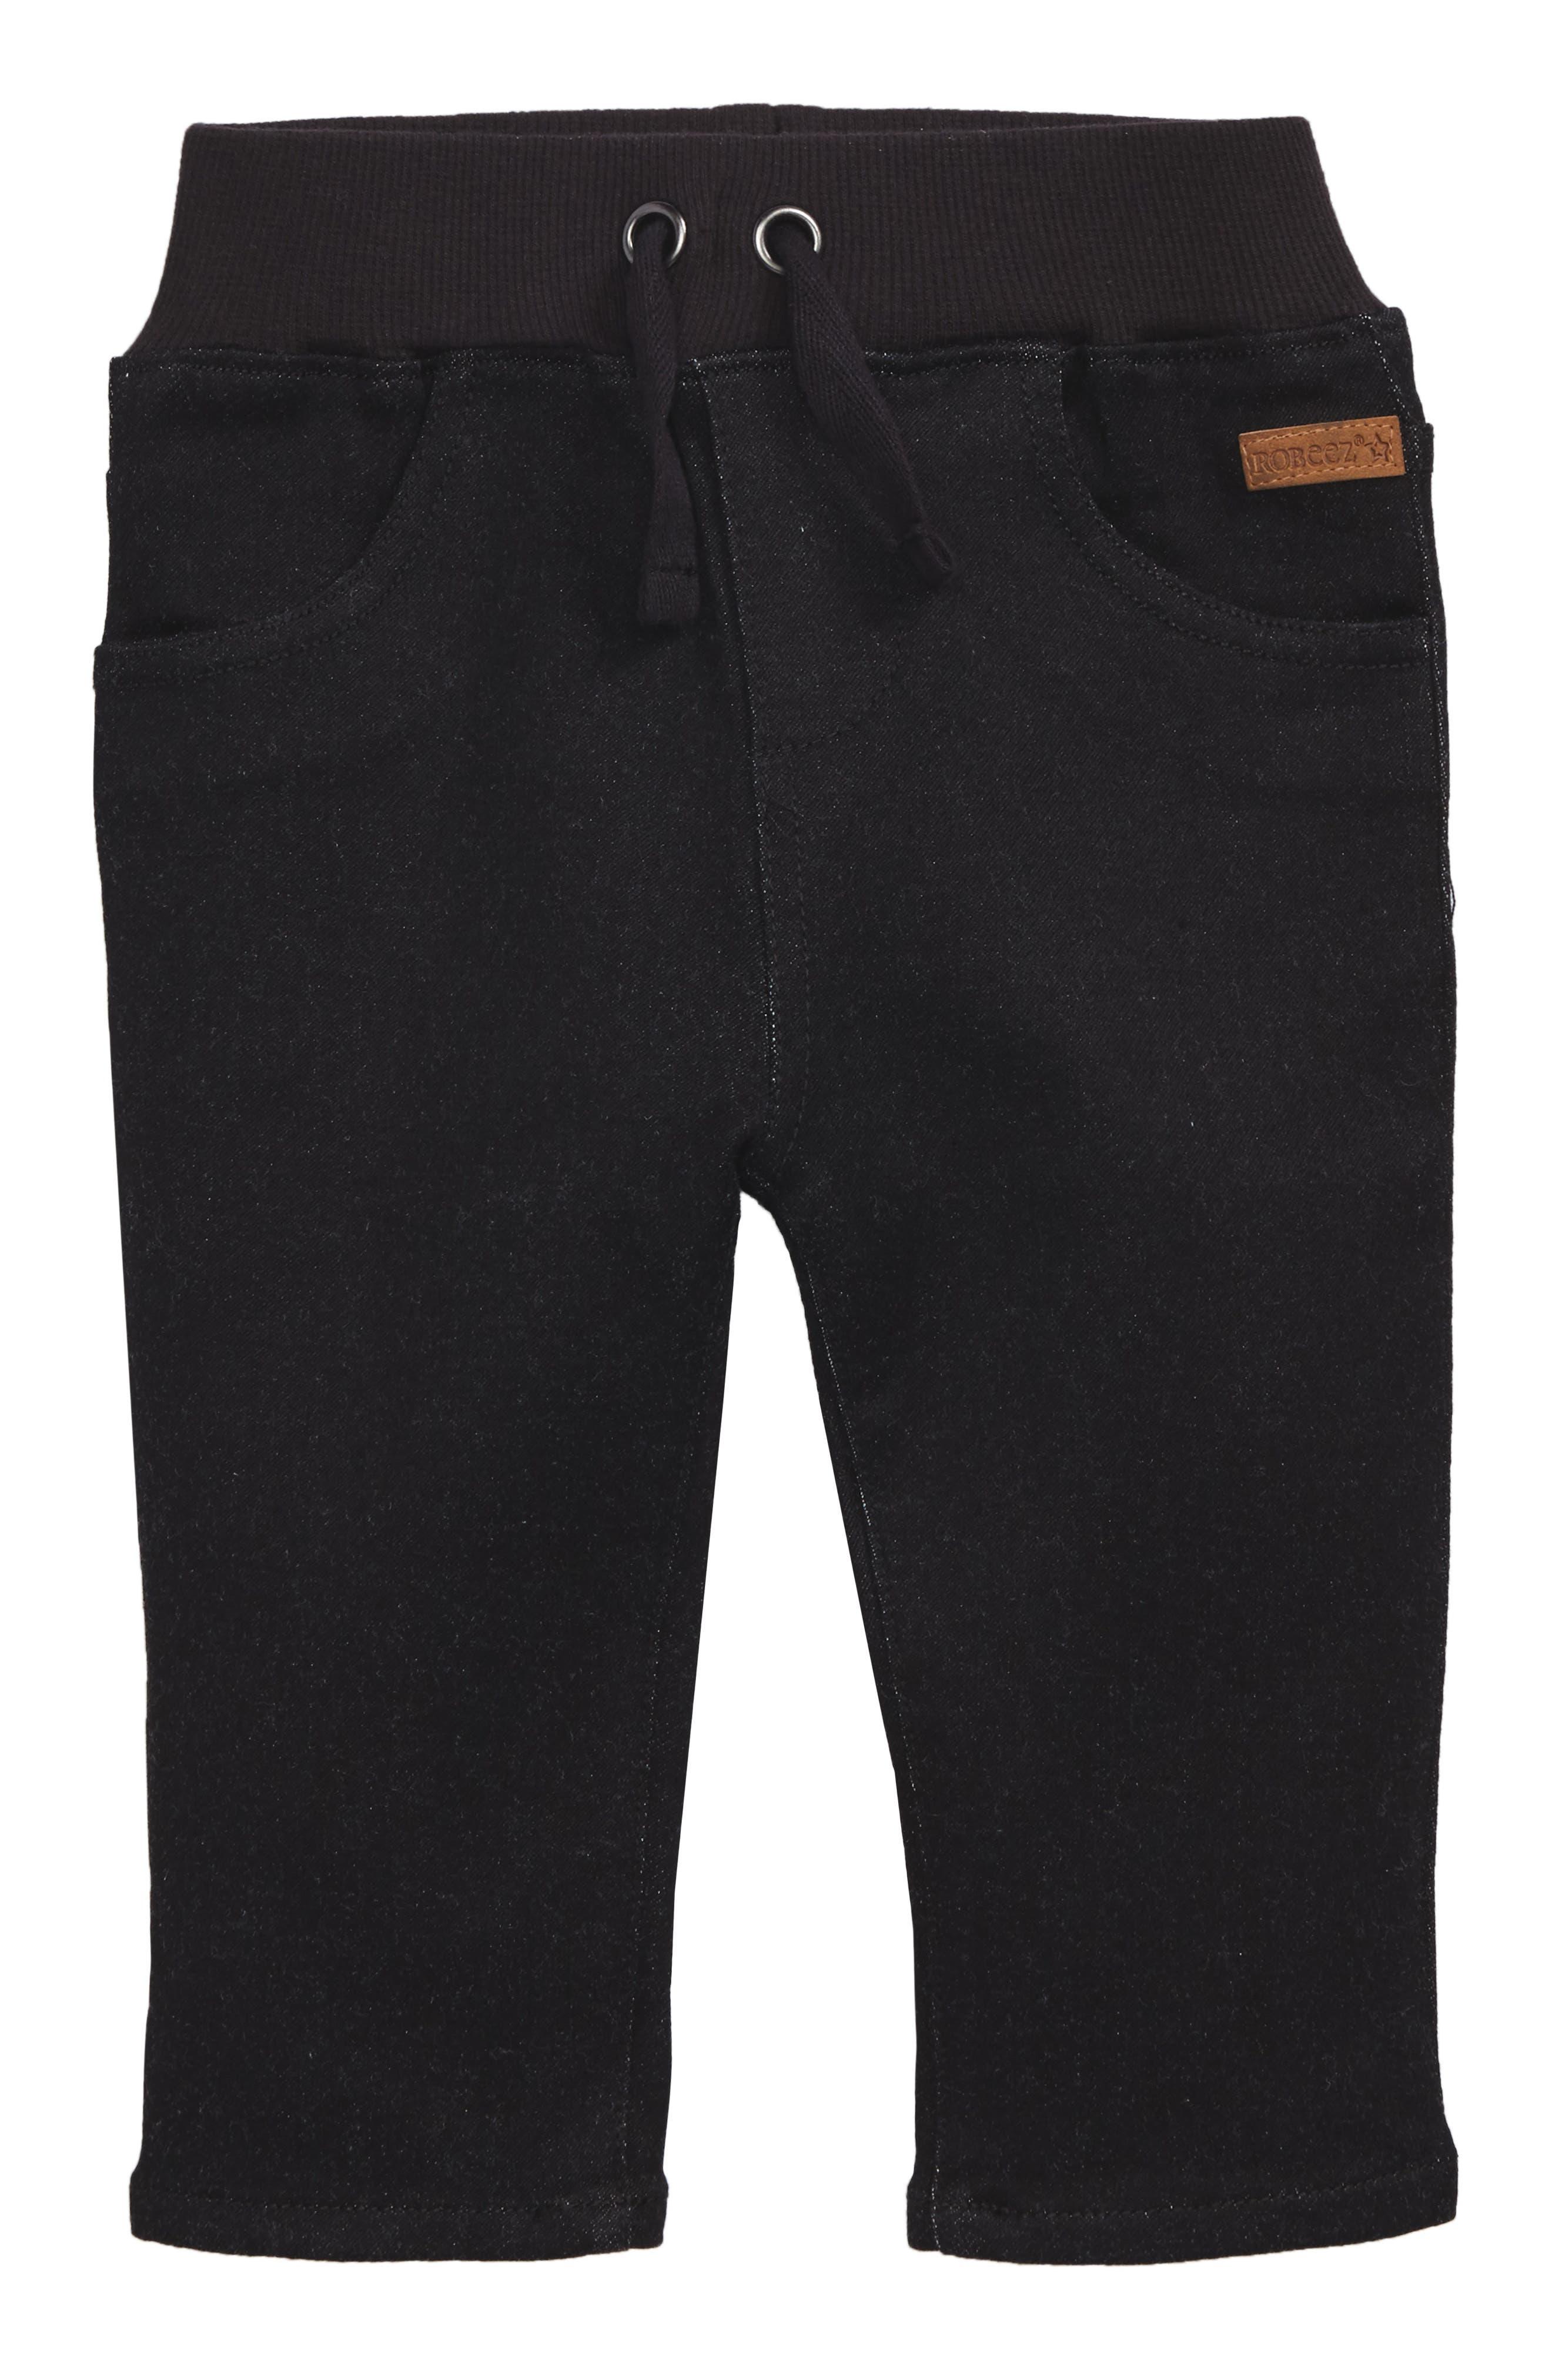 Robeez® Soft Jeans (Baby Boys)